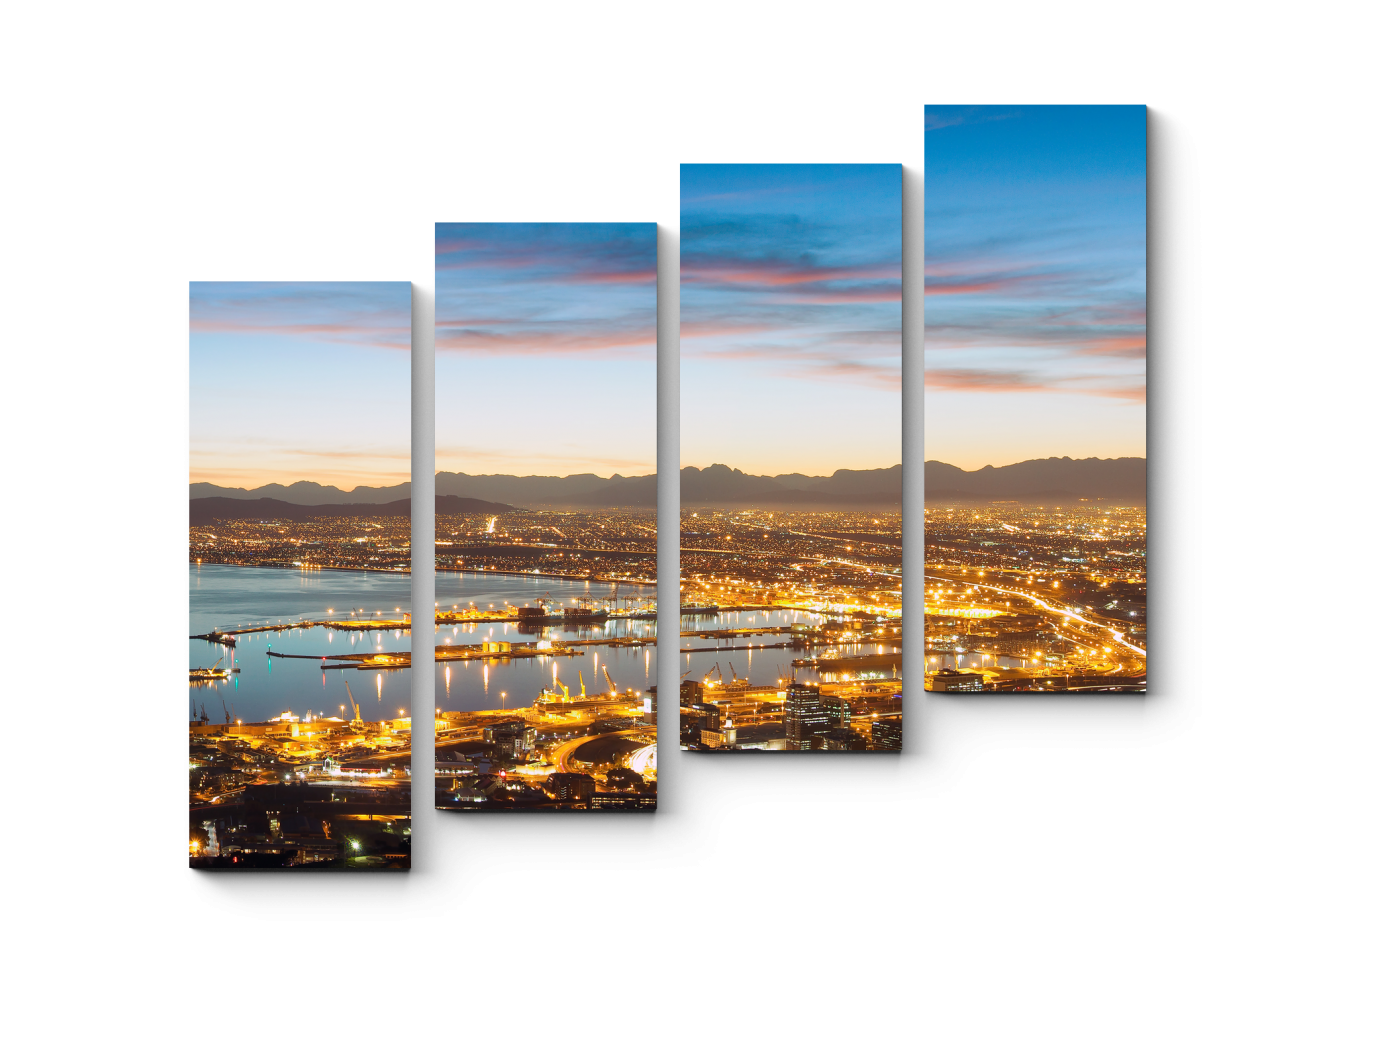 Модульная картина Сказочная панорама Кейптауна (80x69) фото